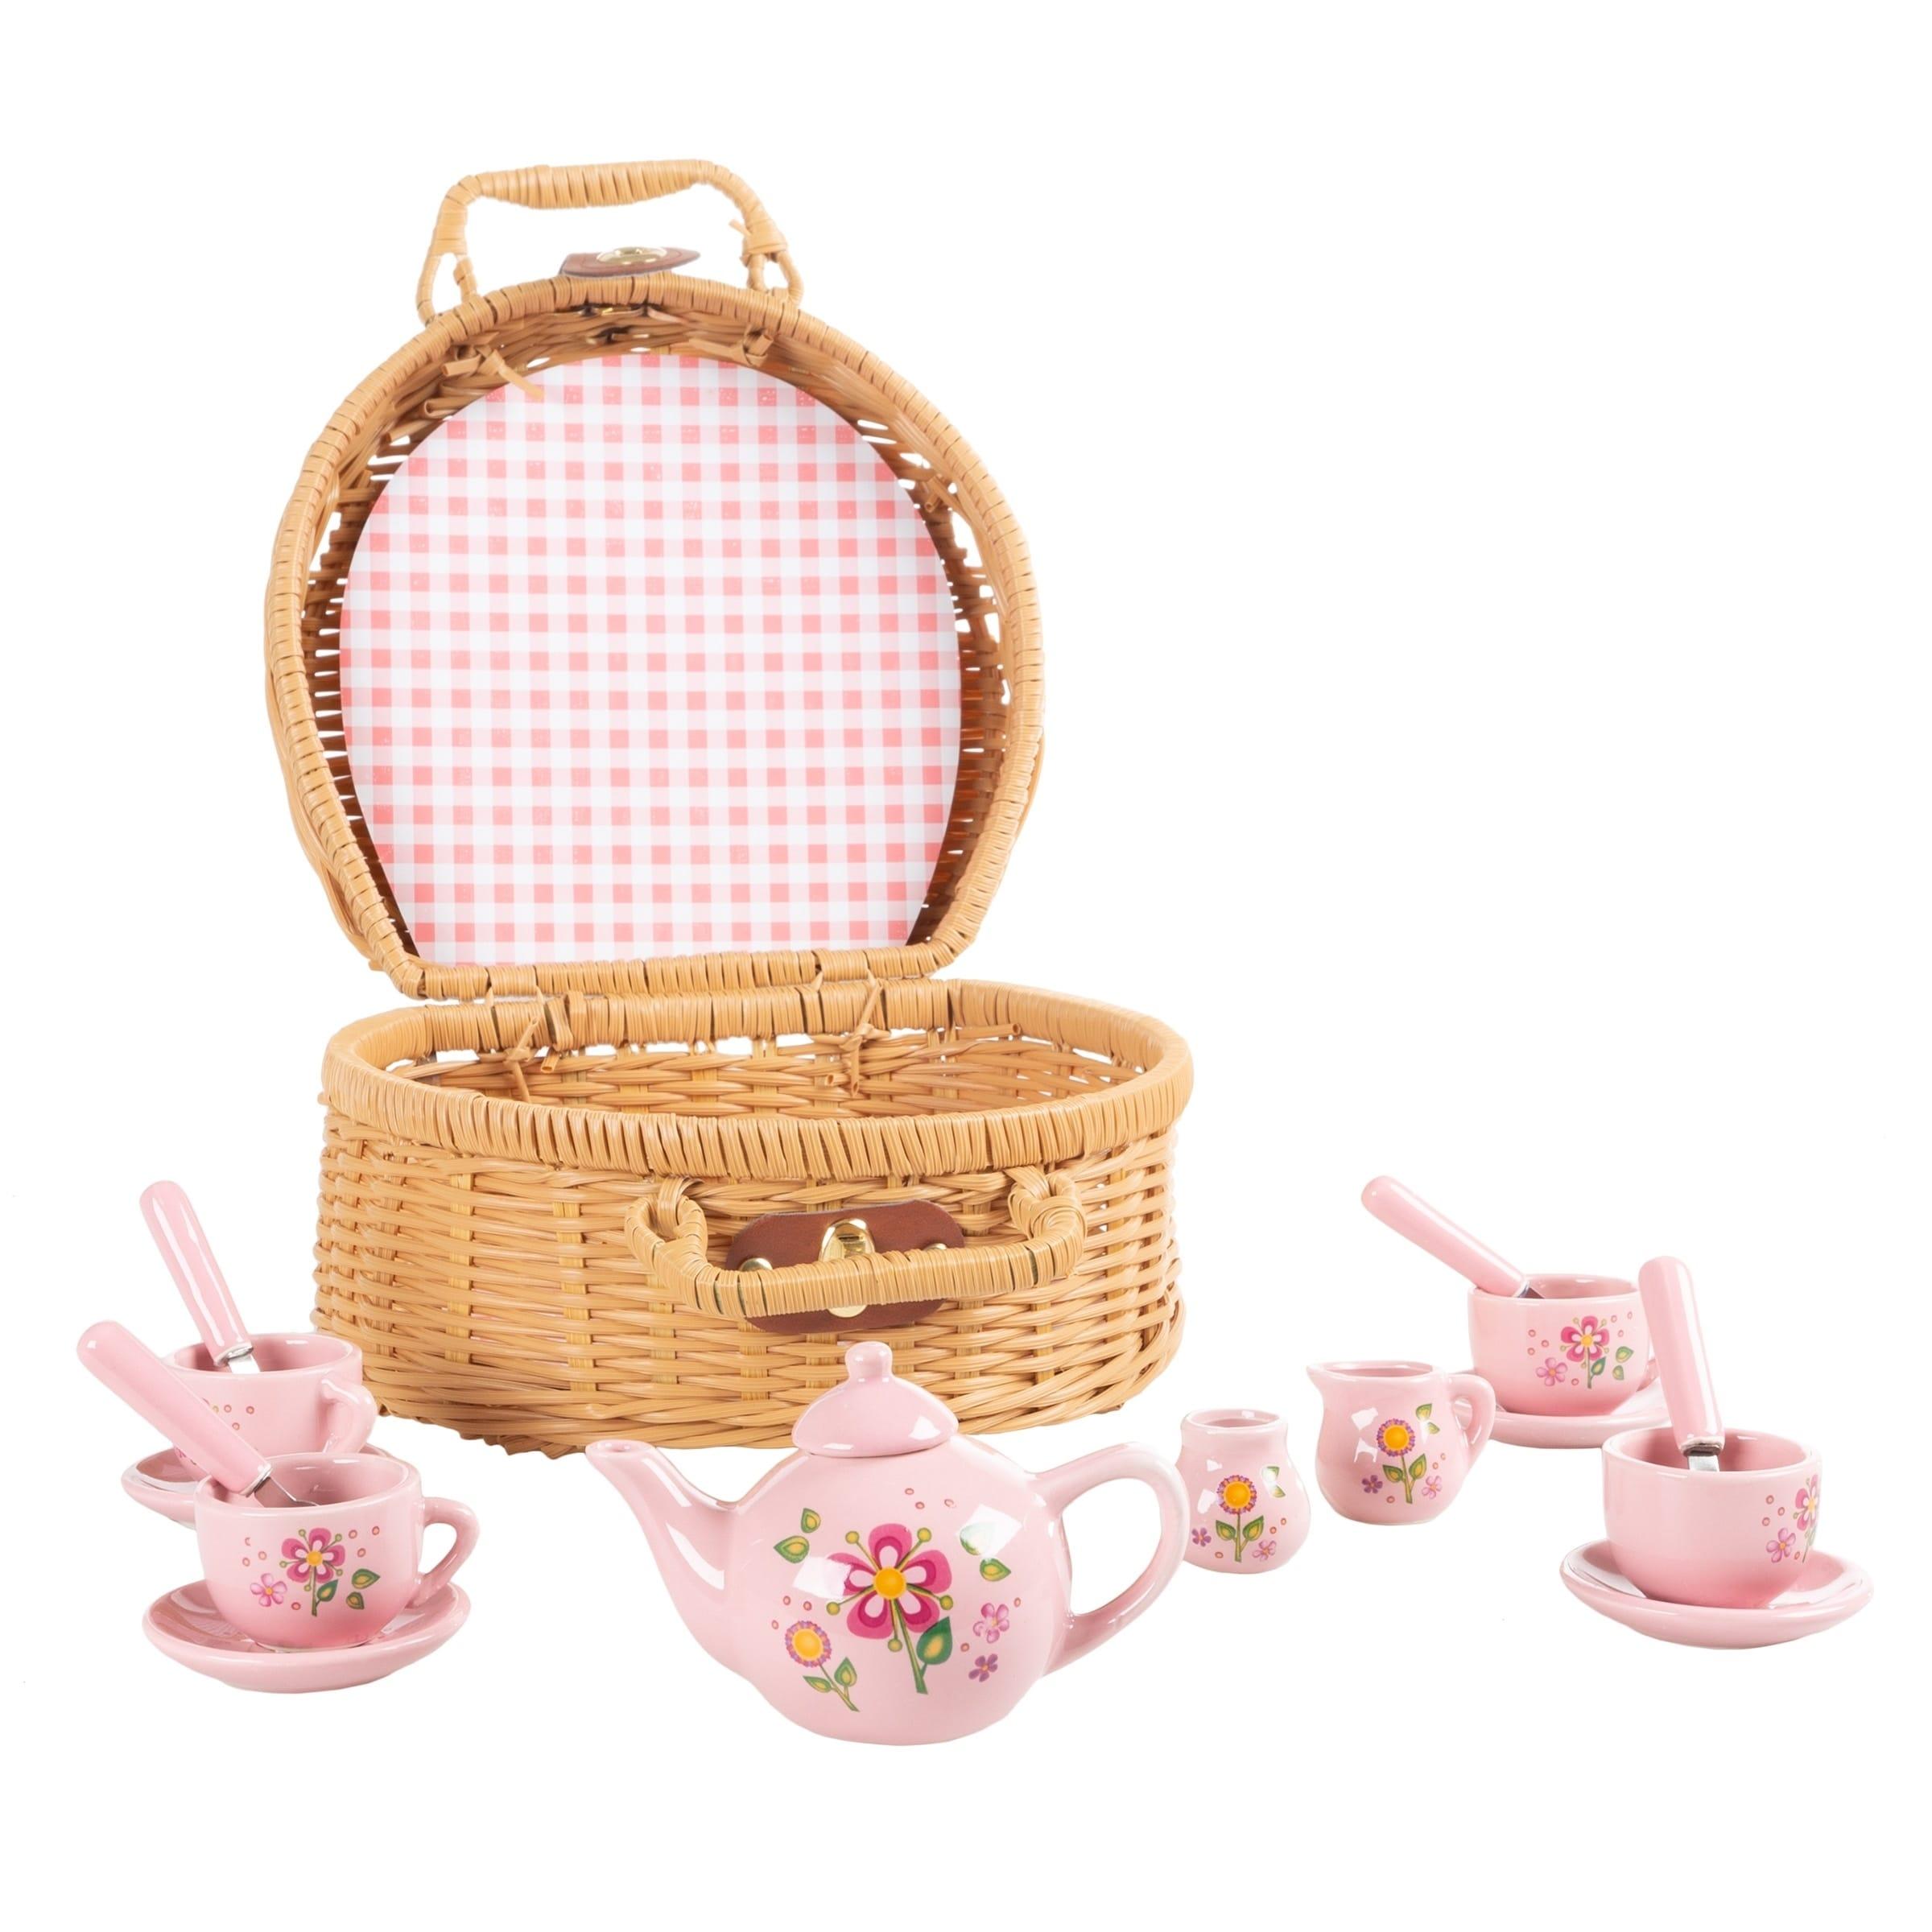 Wood High Tea Toy Set Girl Princess Afternoon Tea Kid Pretend Play Cup Dish Set